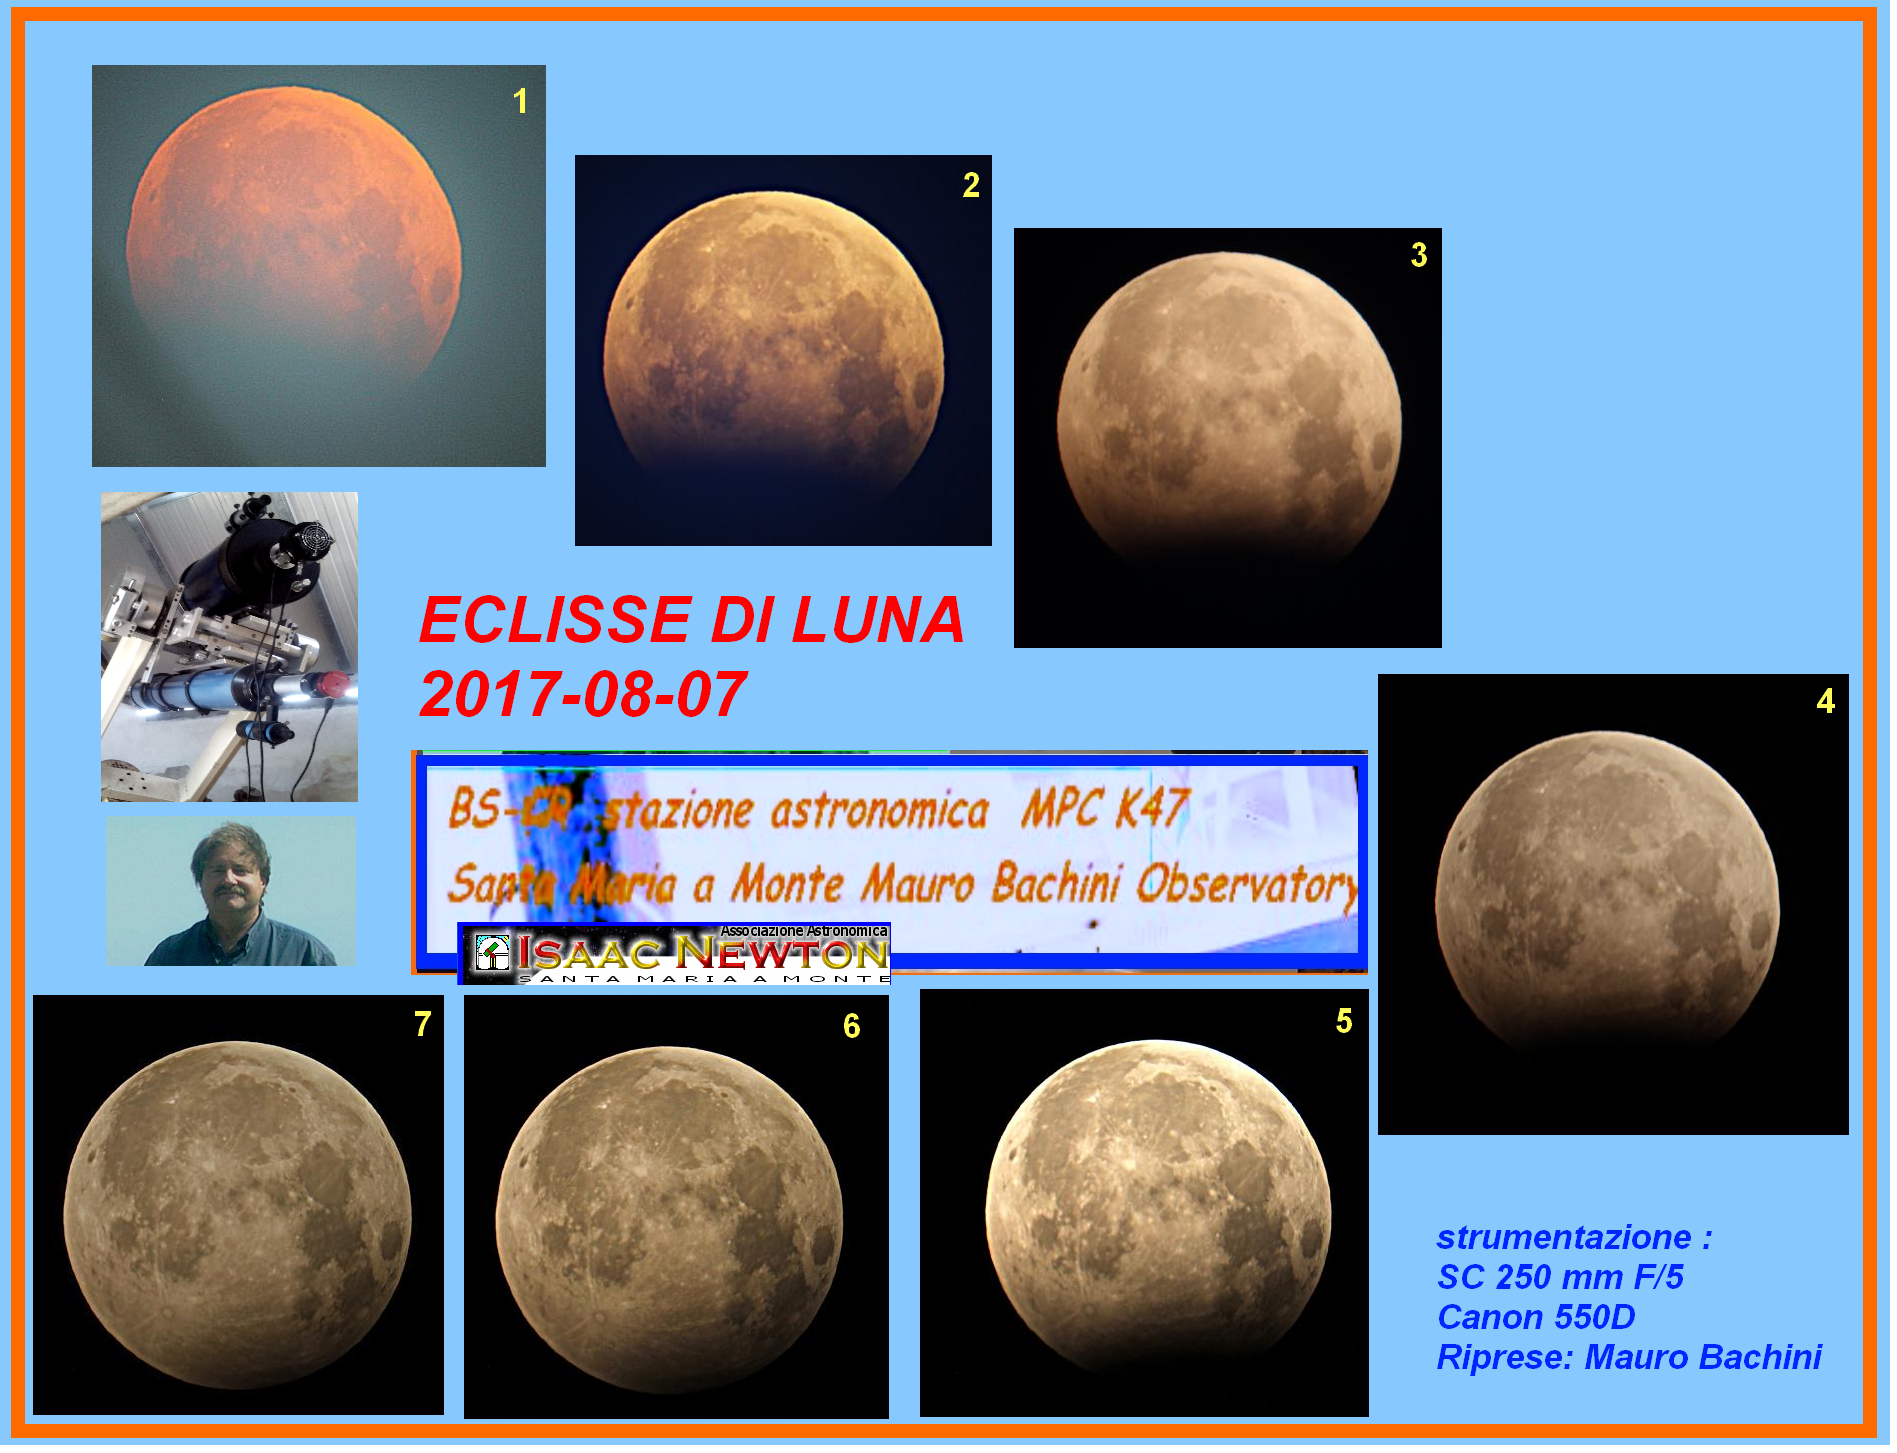 eclisse-luna-2017_08_07somma2.png